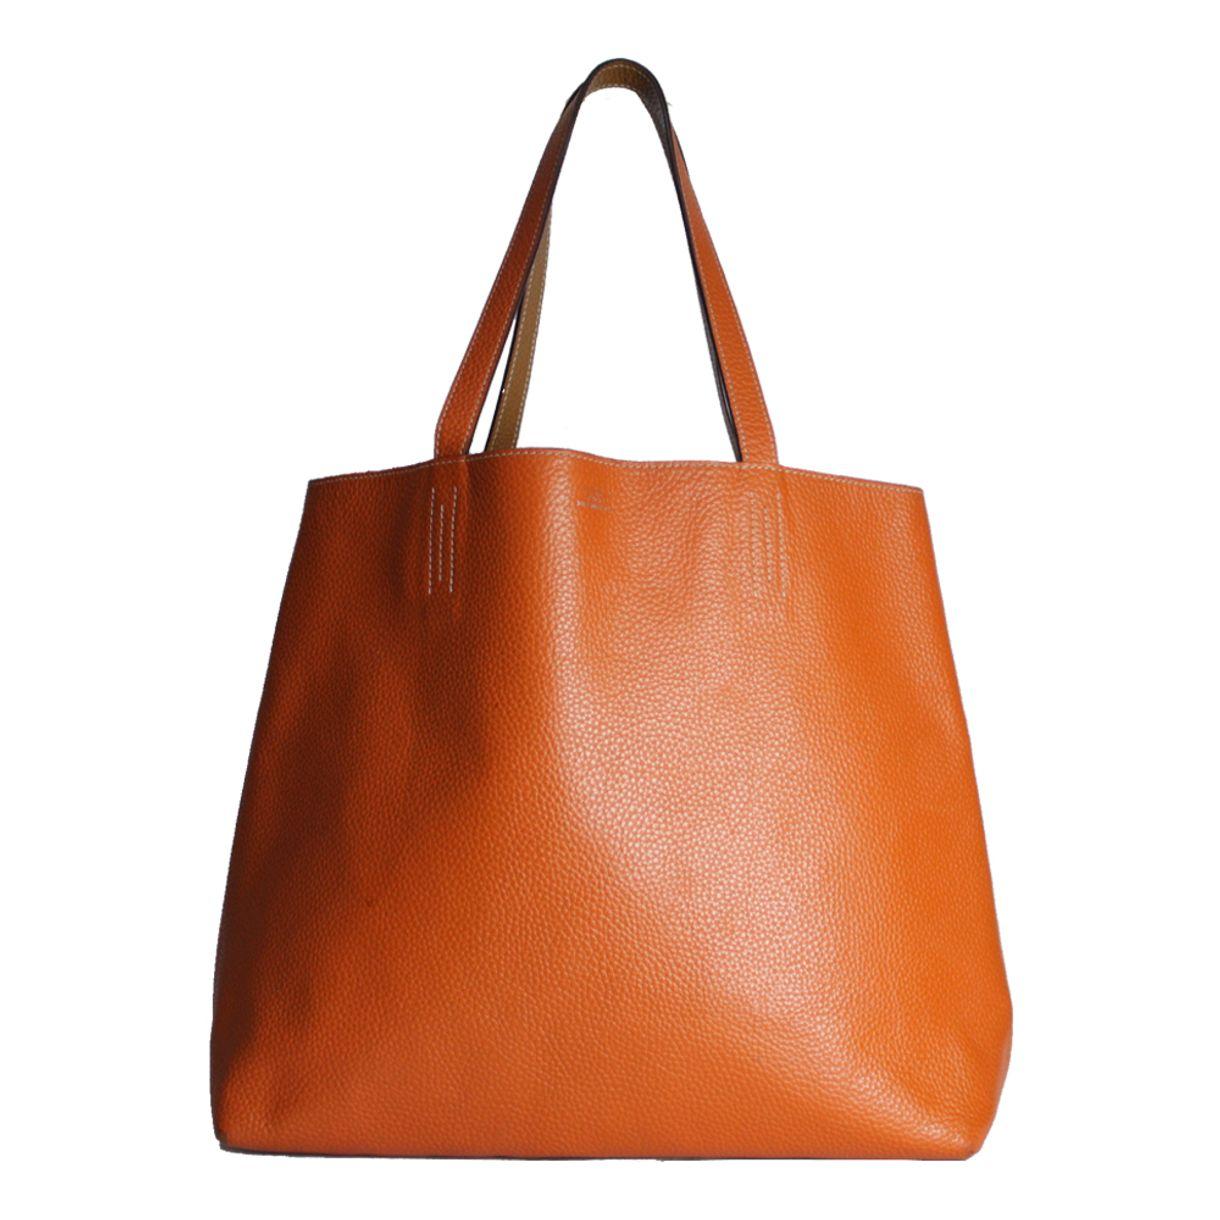 Bolsa-Hermes-Reversible-Tote-Caramelo